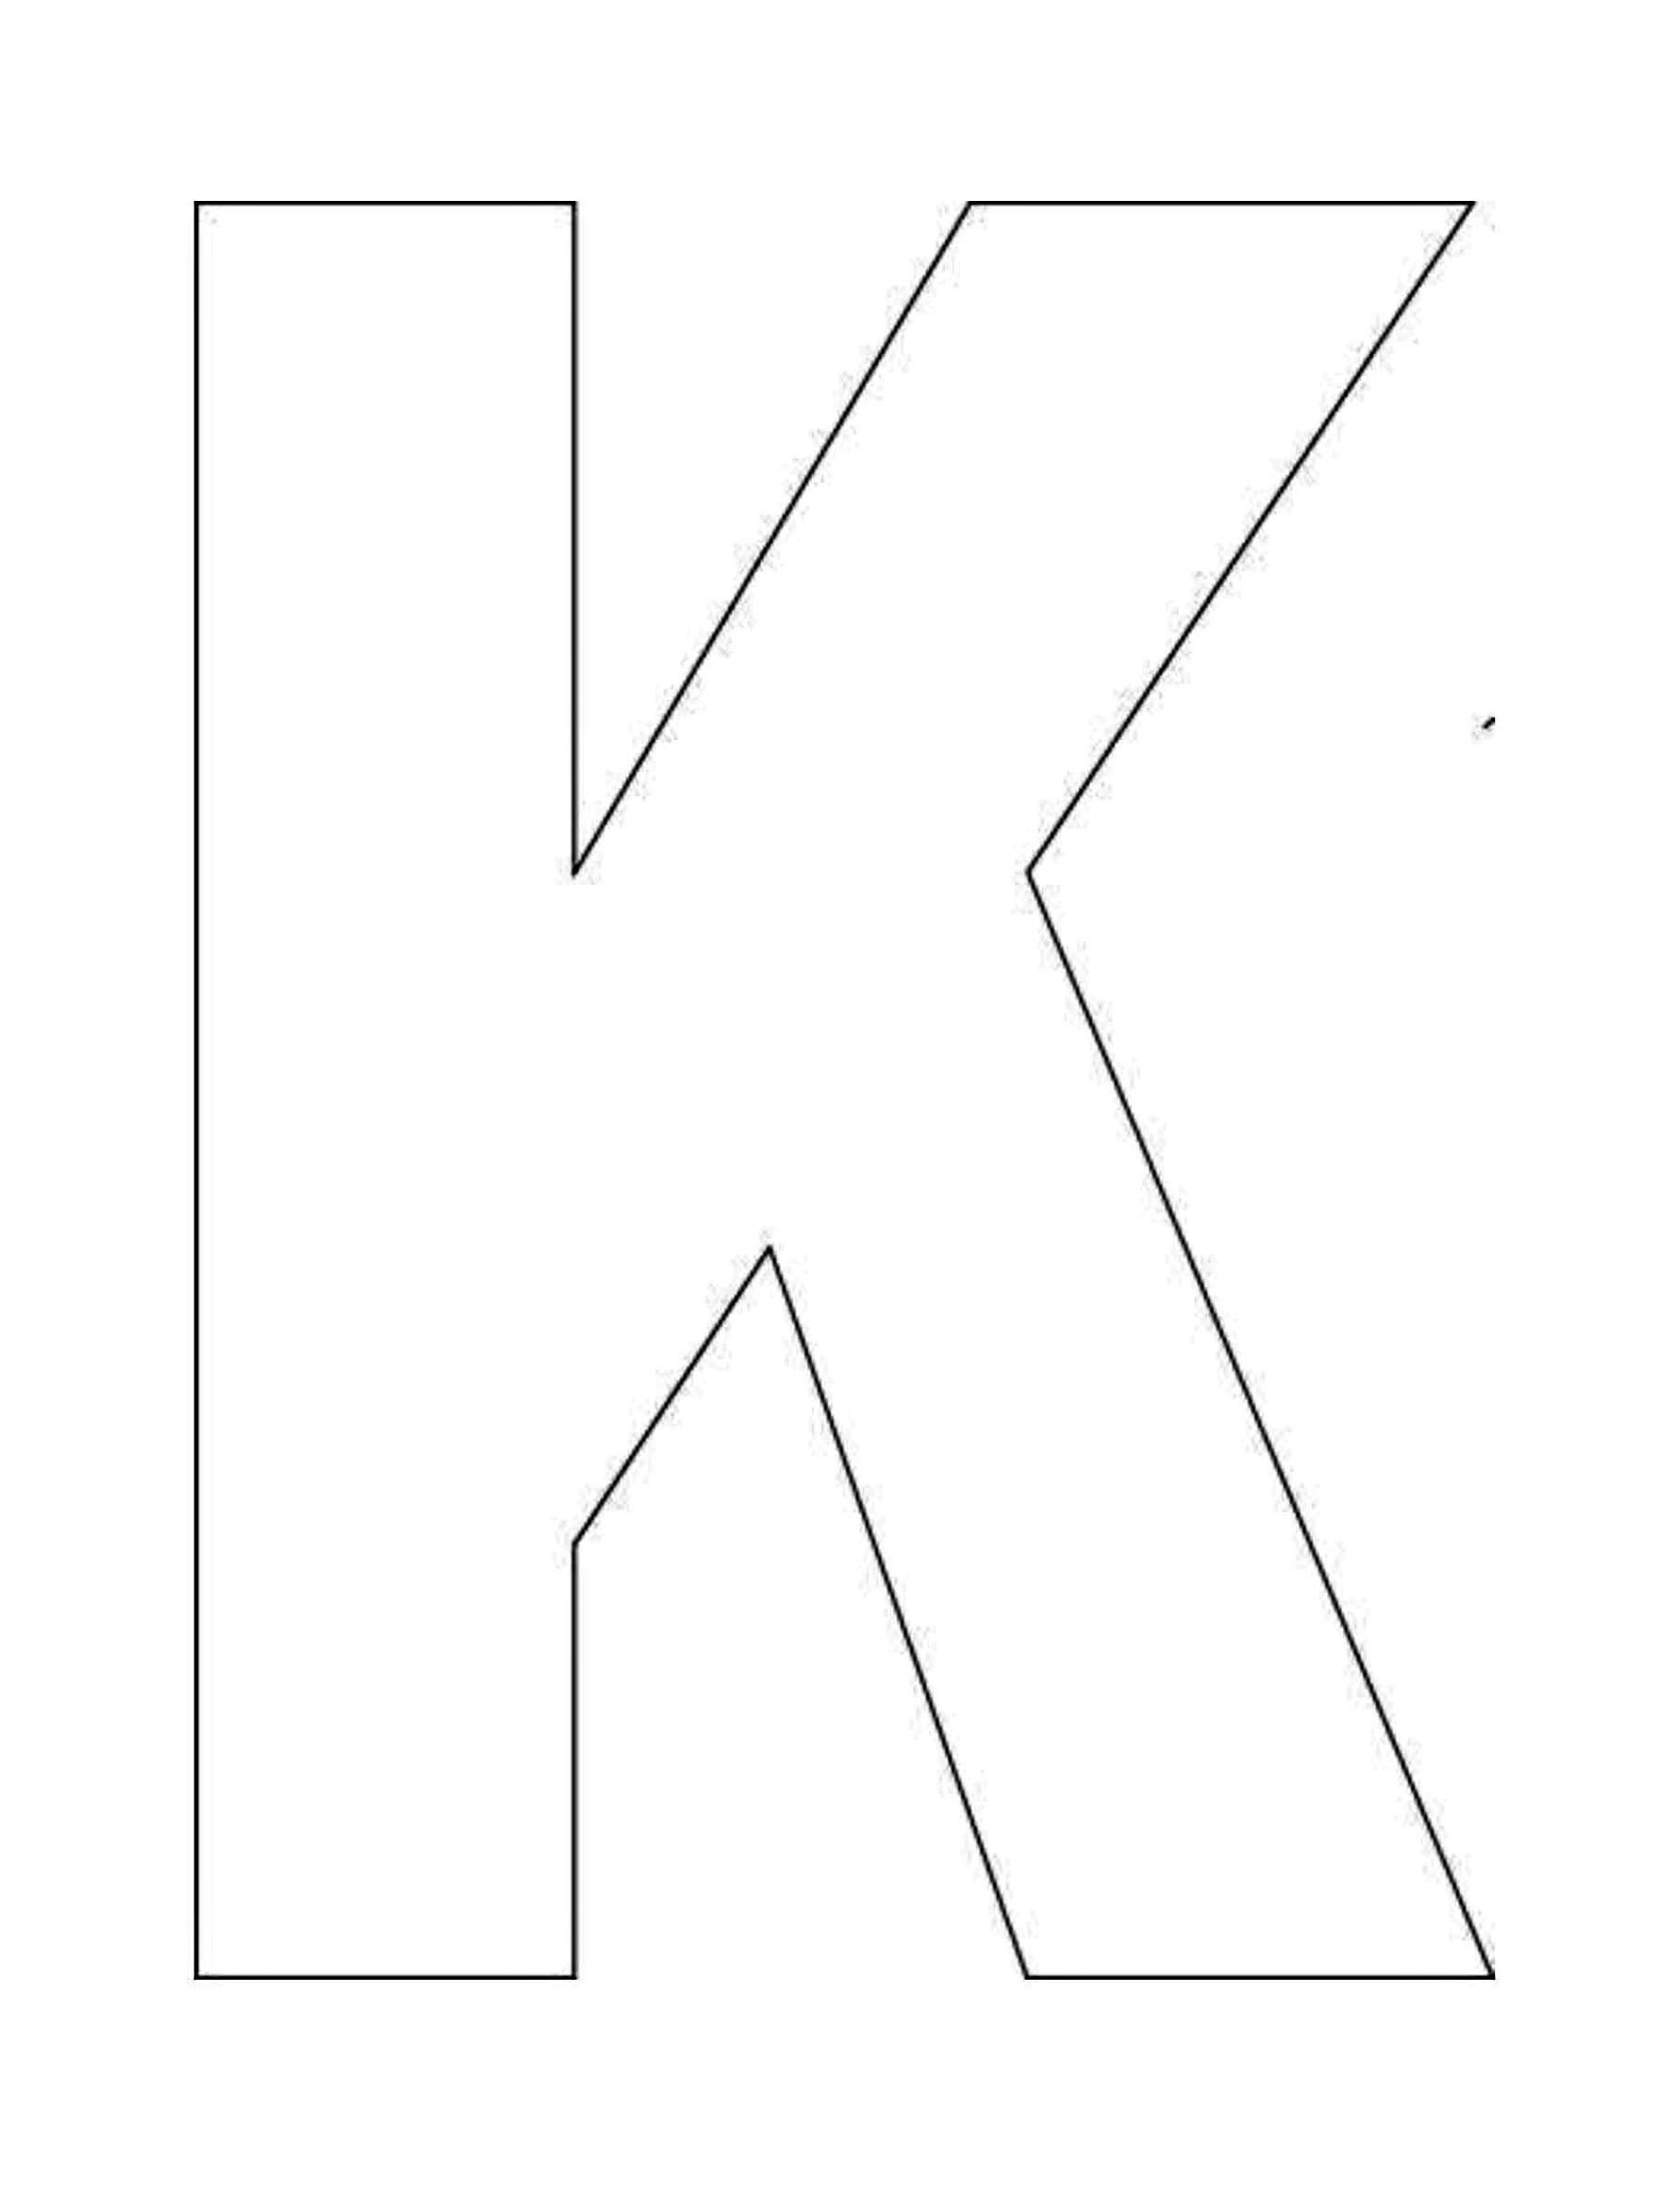 بالصور صور حرف k , تصميمات حصرية حرف k 5656 2